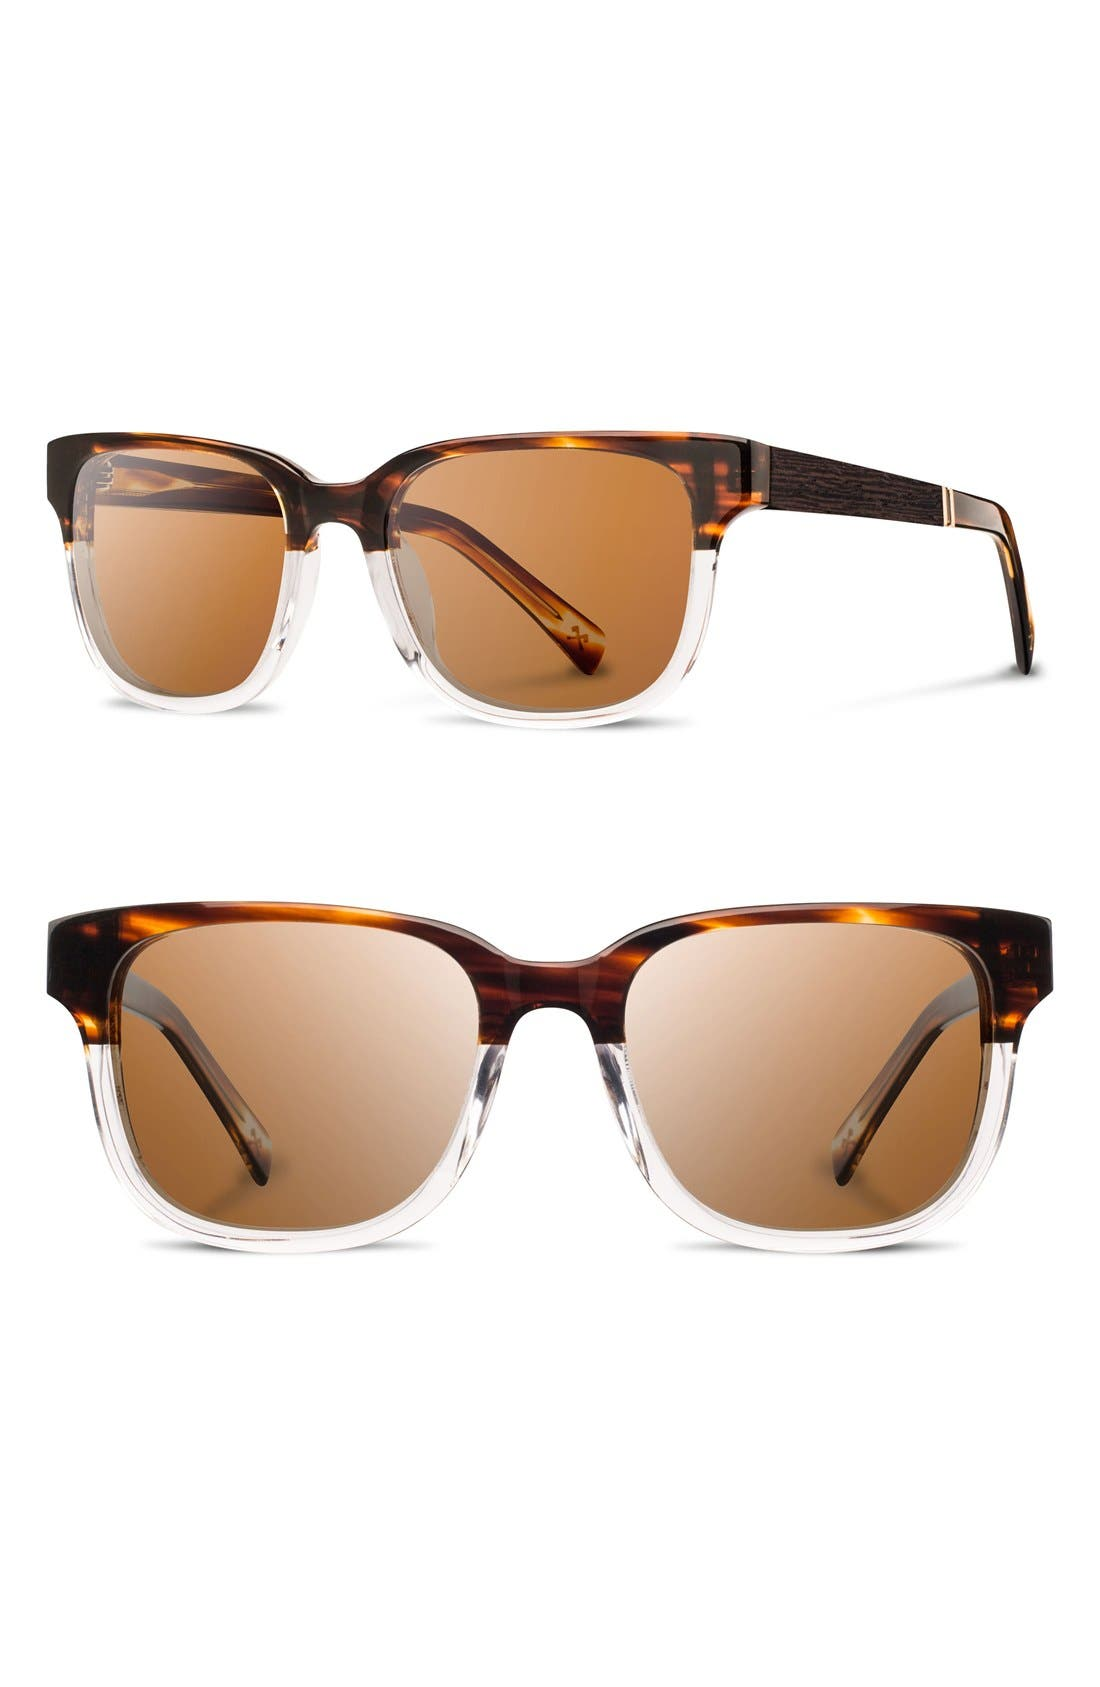 Shwood 'Prescott' 52mm Polarized Acetate & Wood Sunglasses